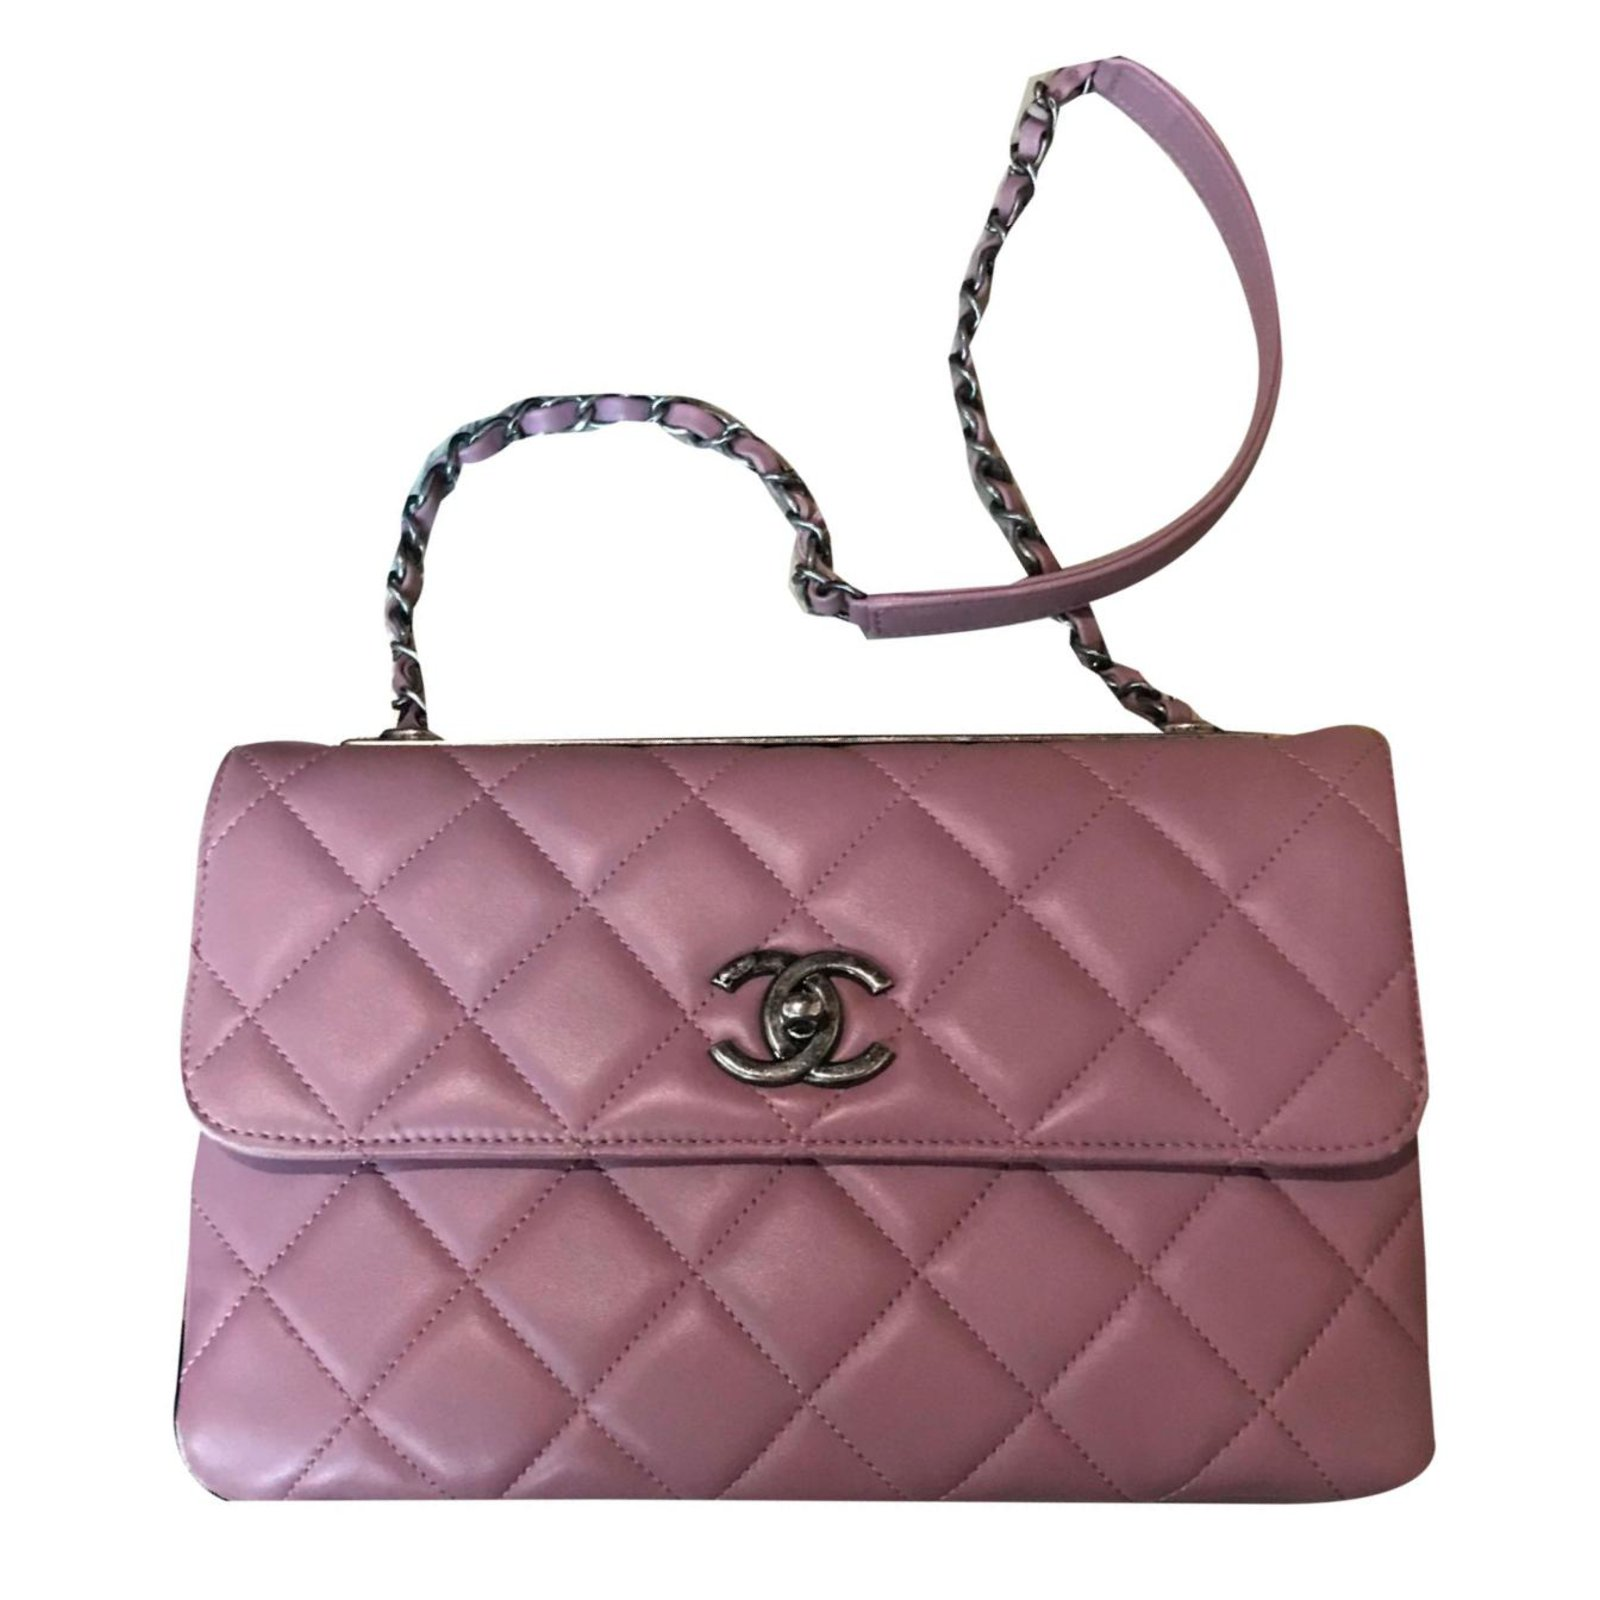 0ca5b7cef219 Chanel Handbags Pink - Foto Handbag All Collections Salonagafiya.Com